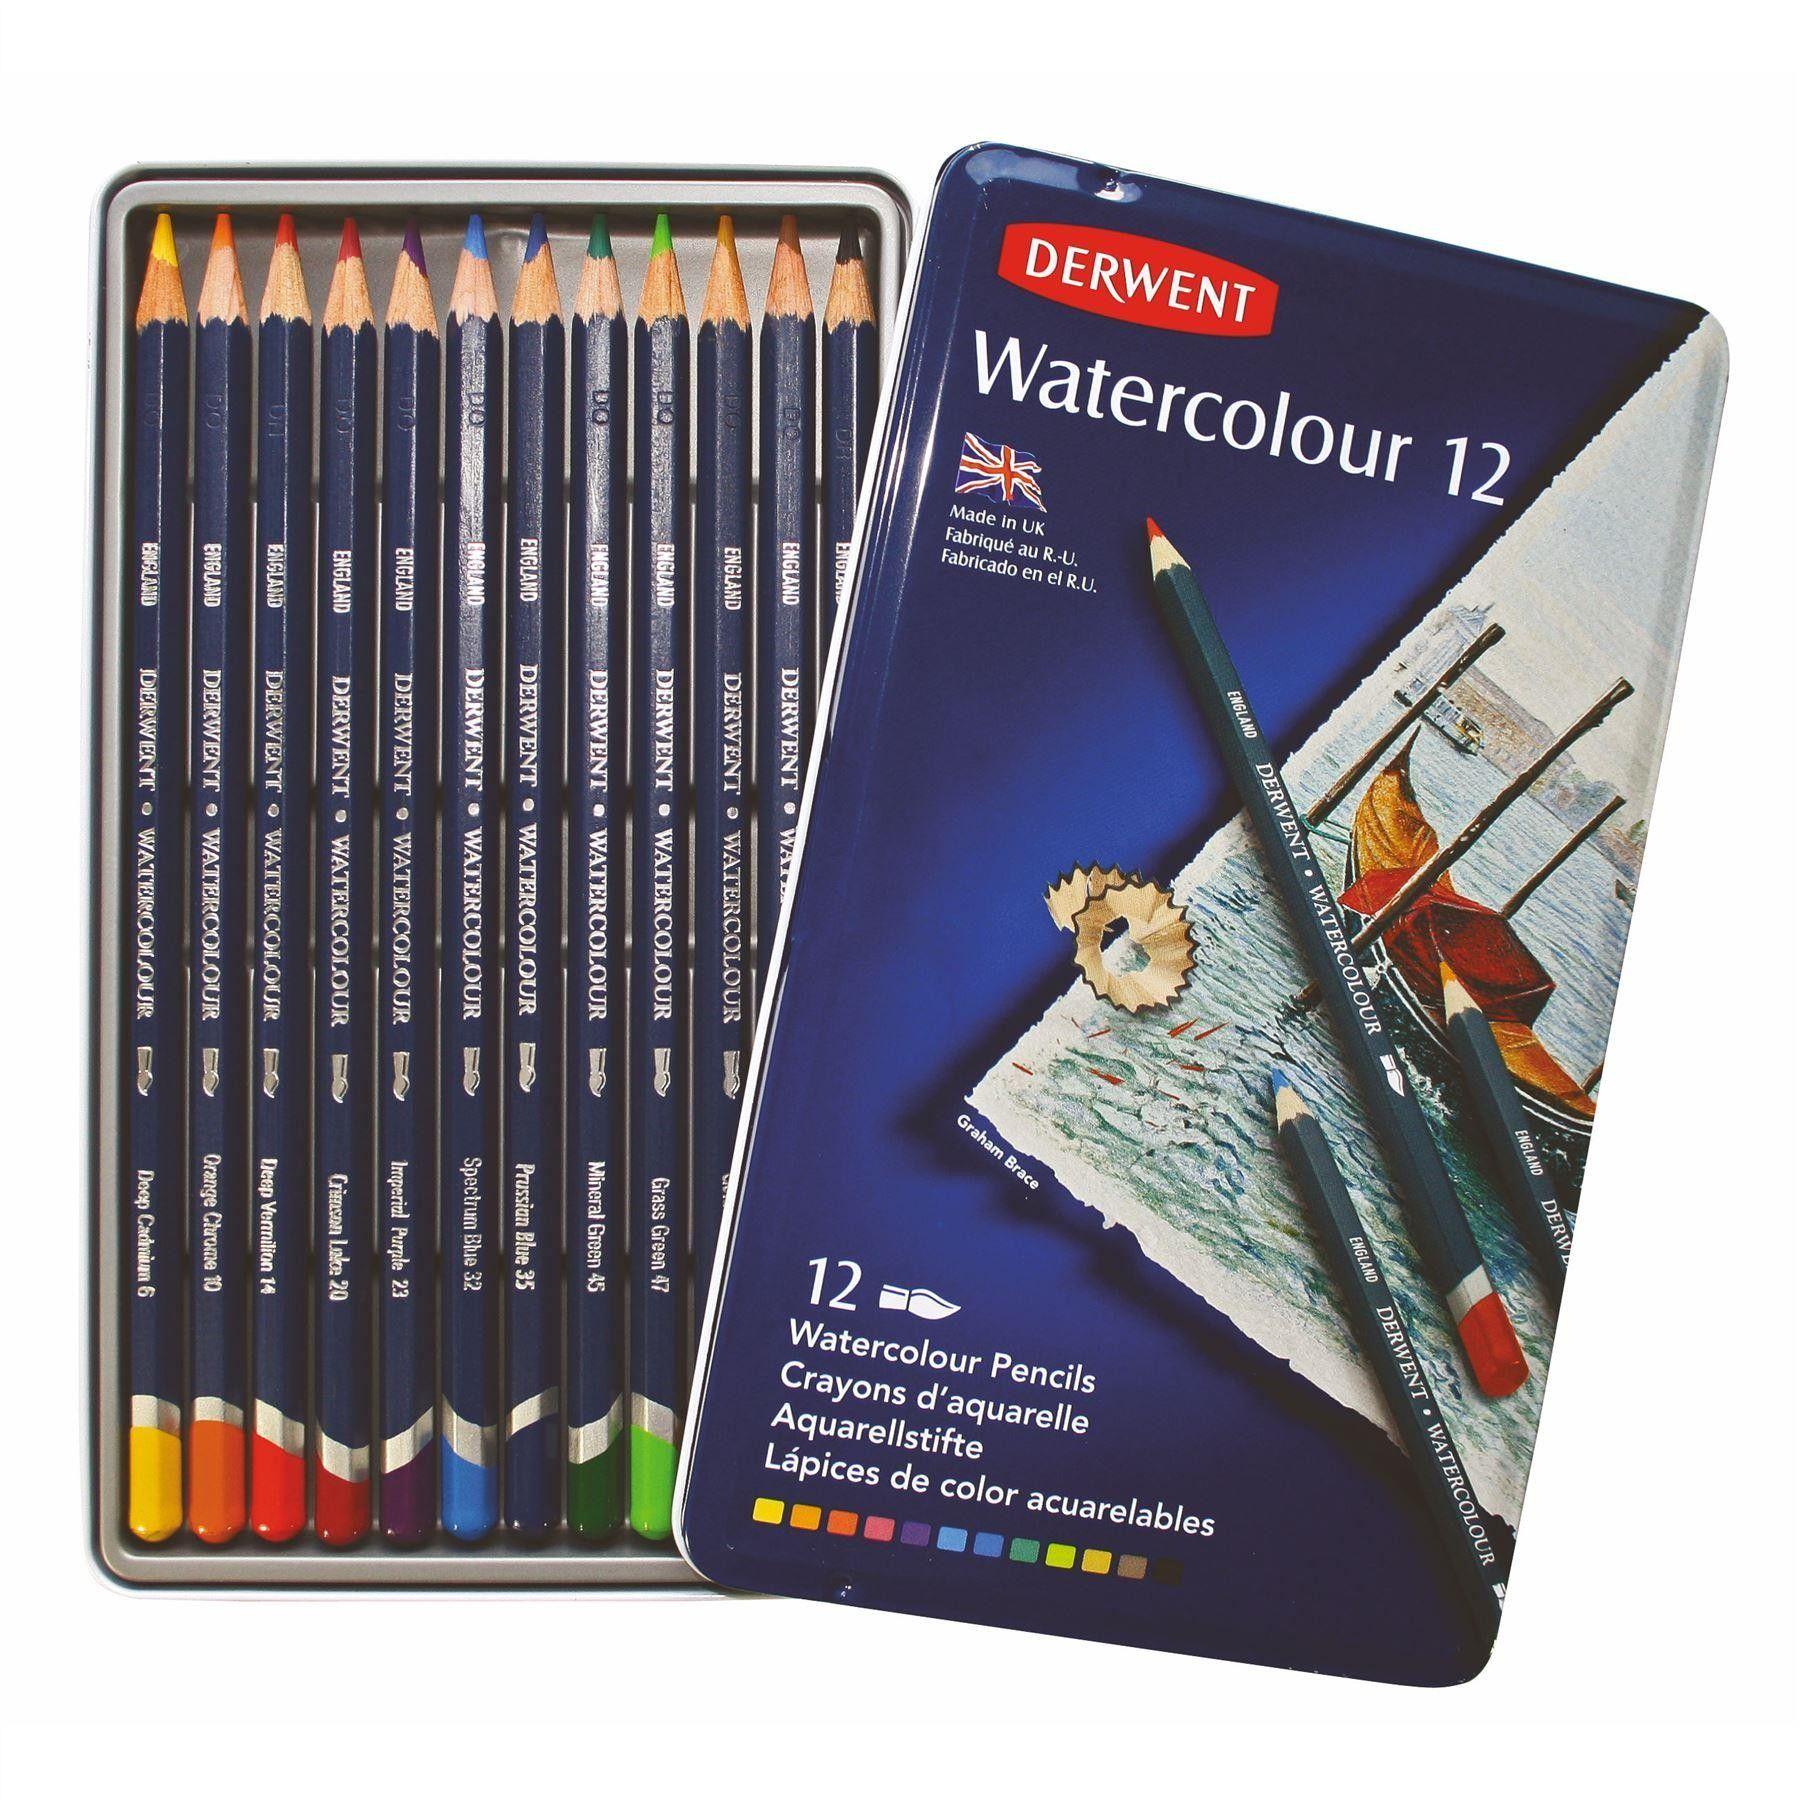 Derwent Watercolour 12 Tin Watercolor Pencils Art Pencil Set